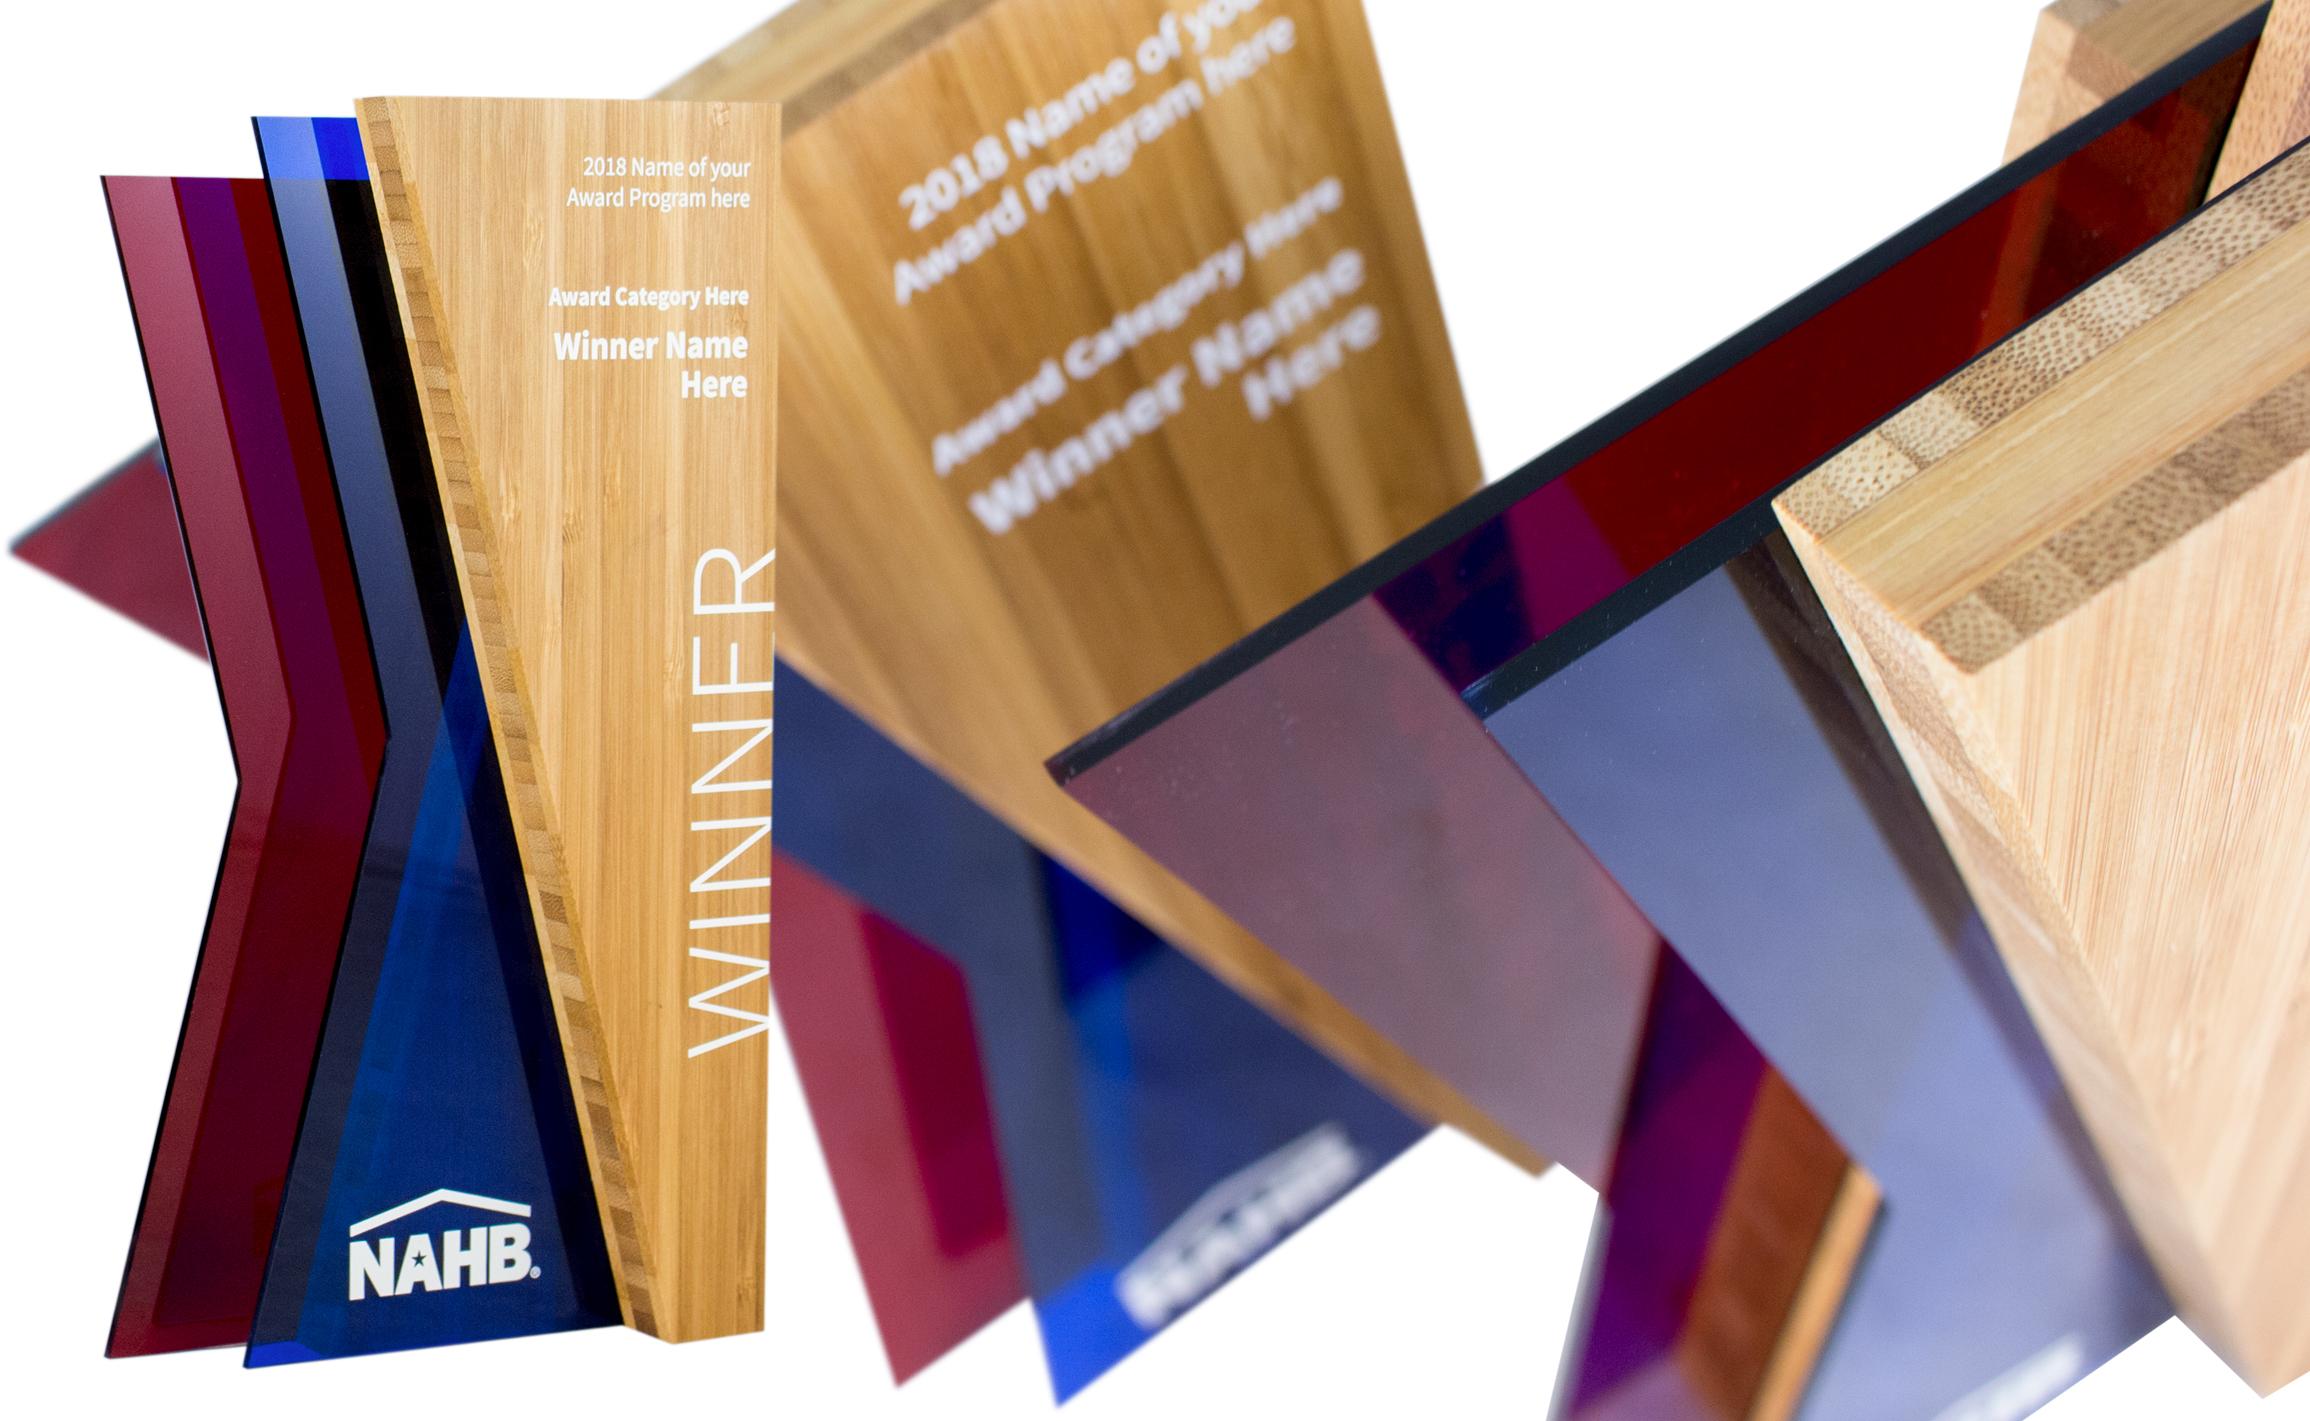 nahb awards - custom design